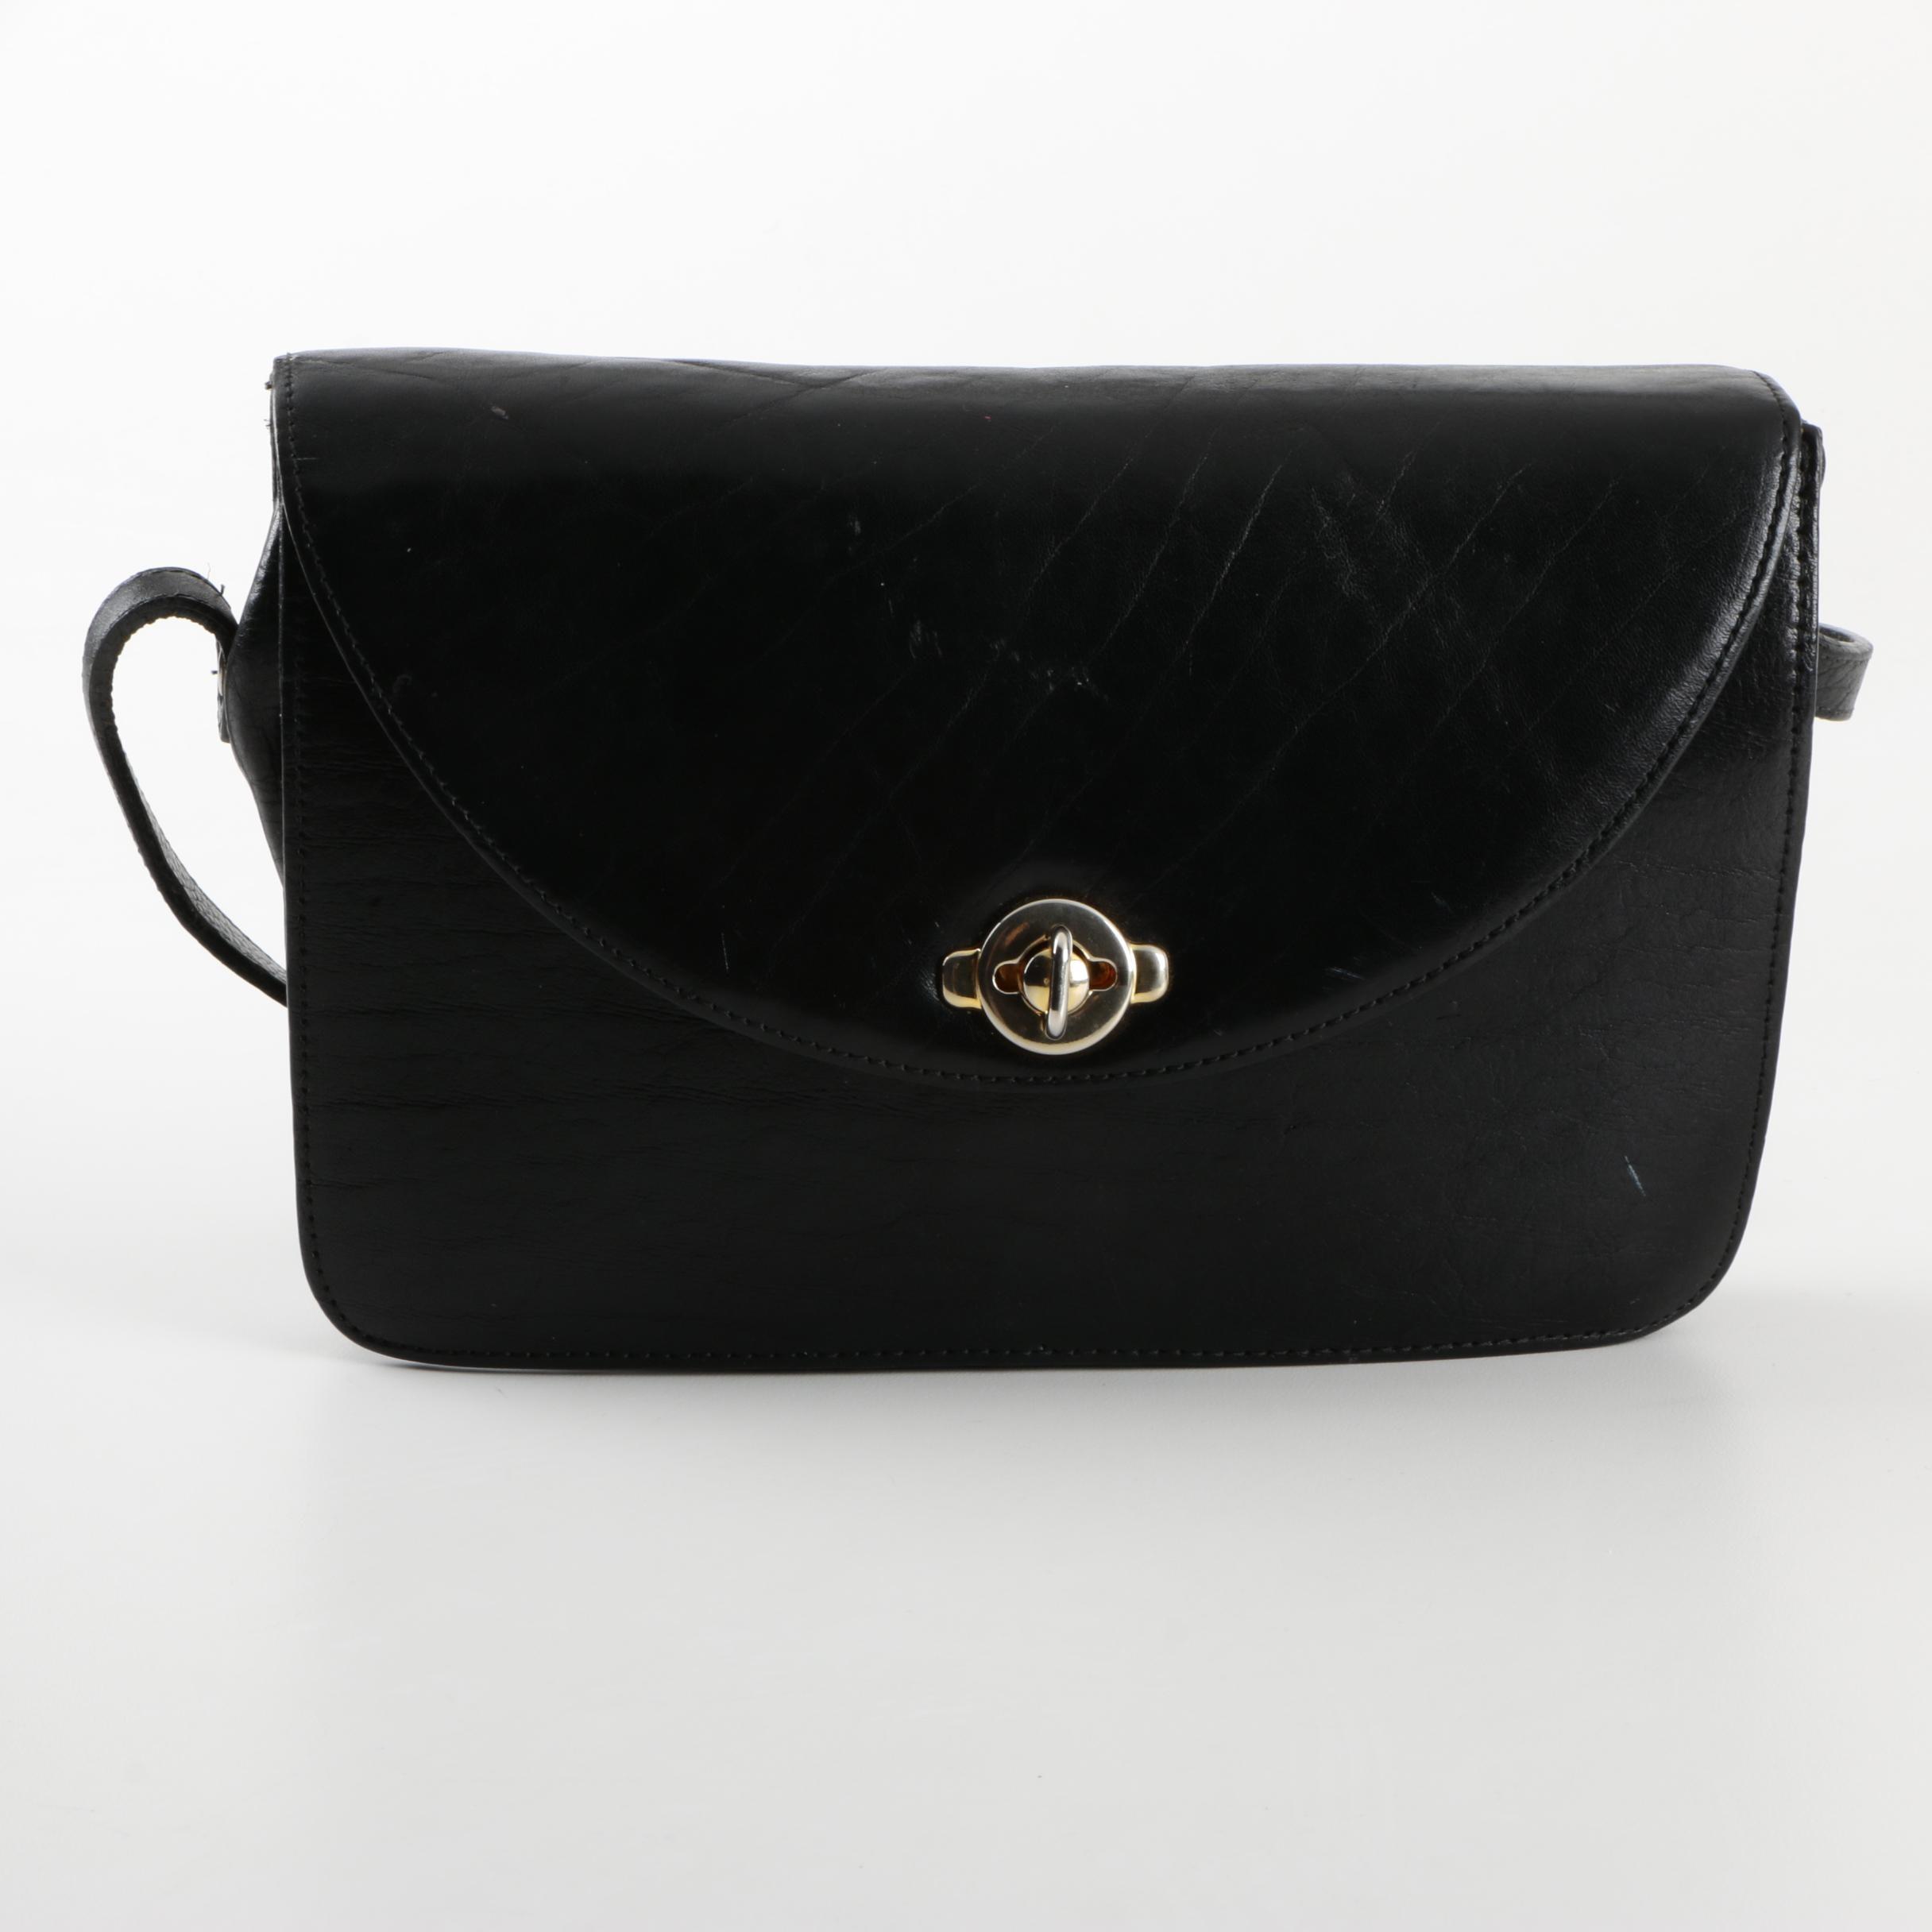 Gabbriele Black Leather Crossbody Bag